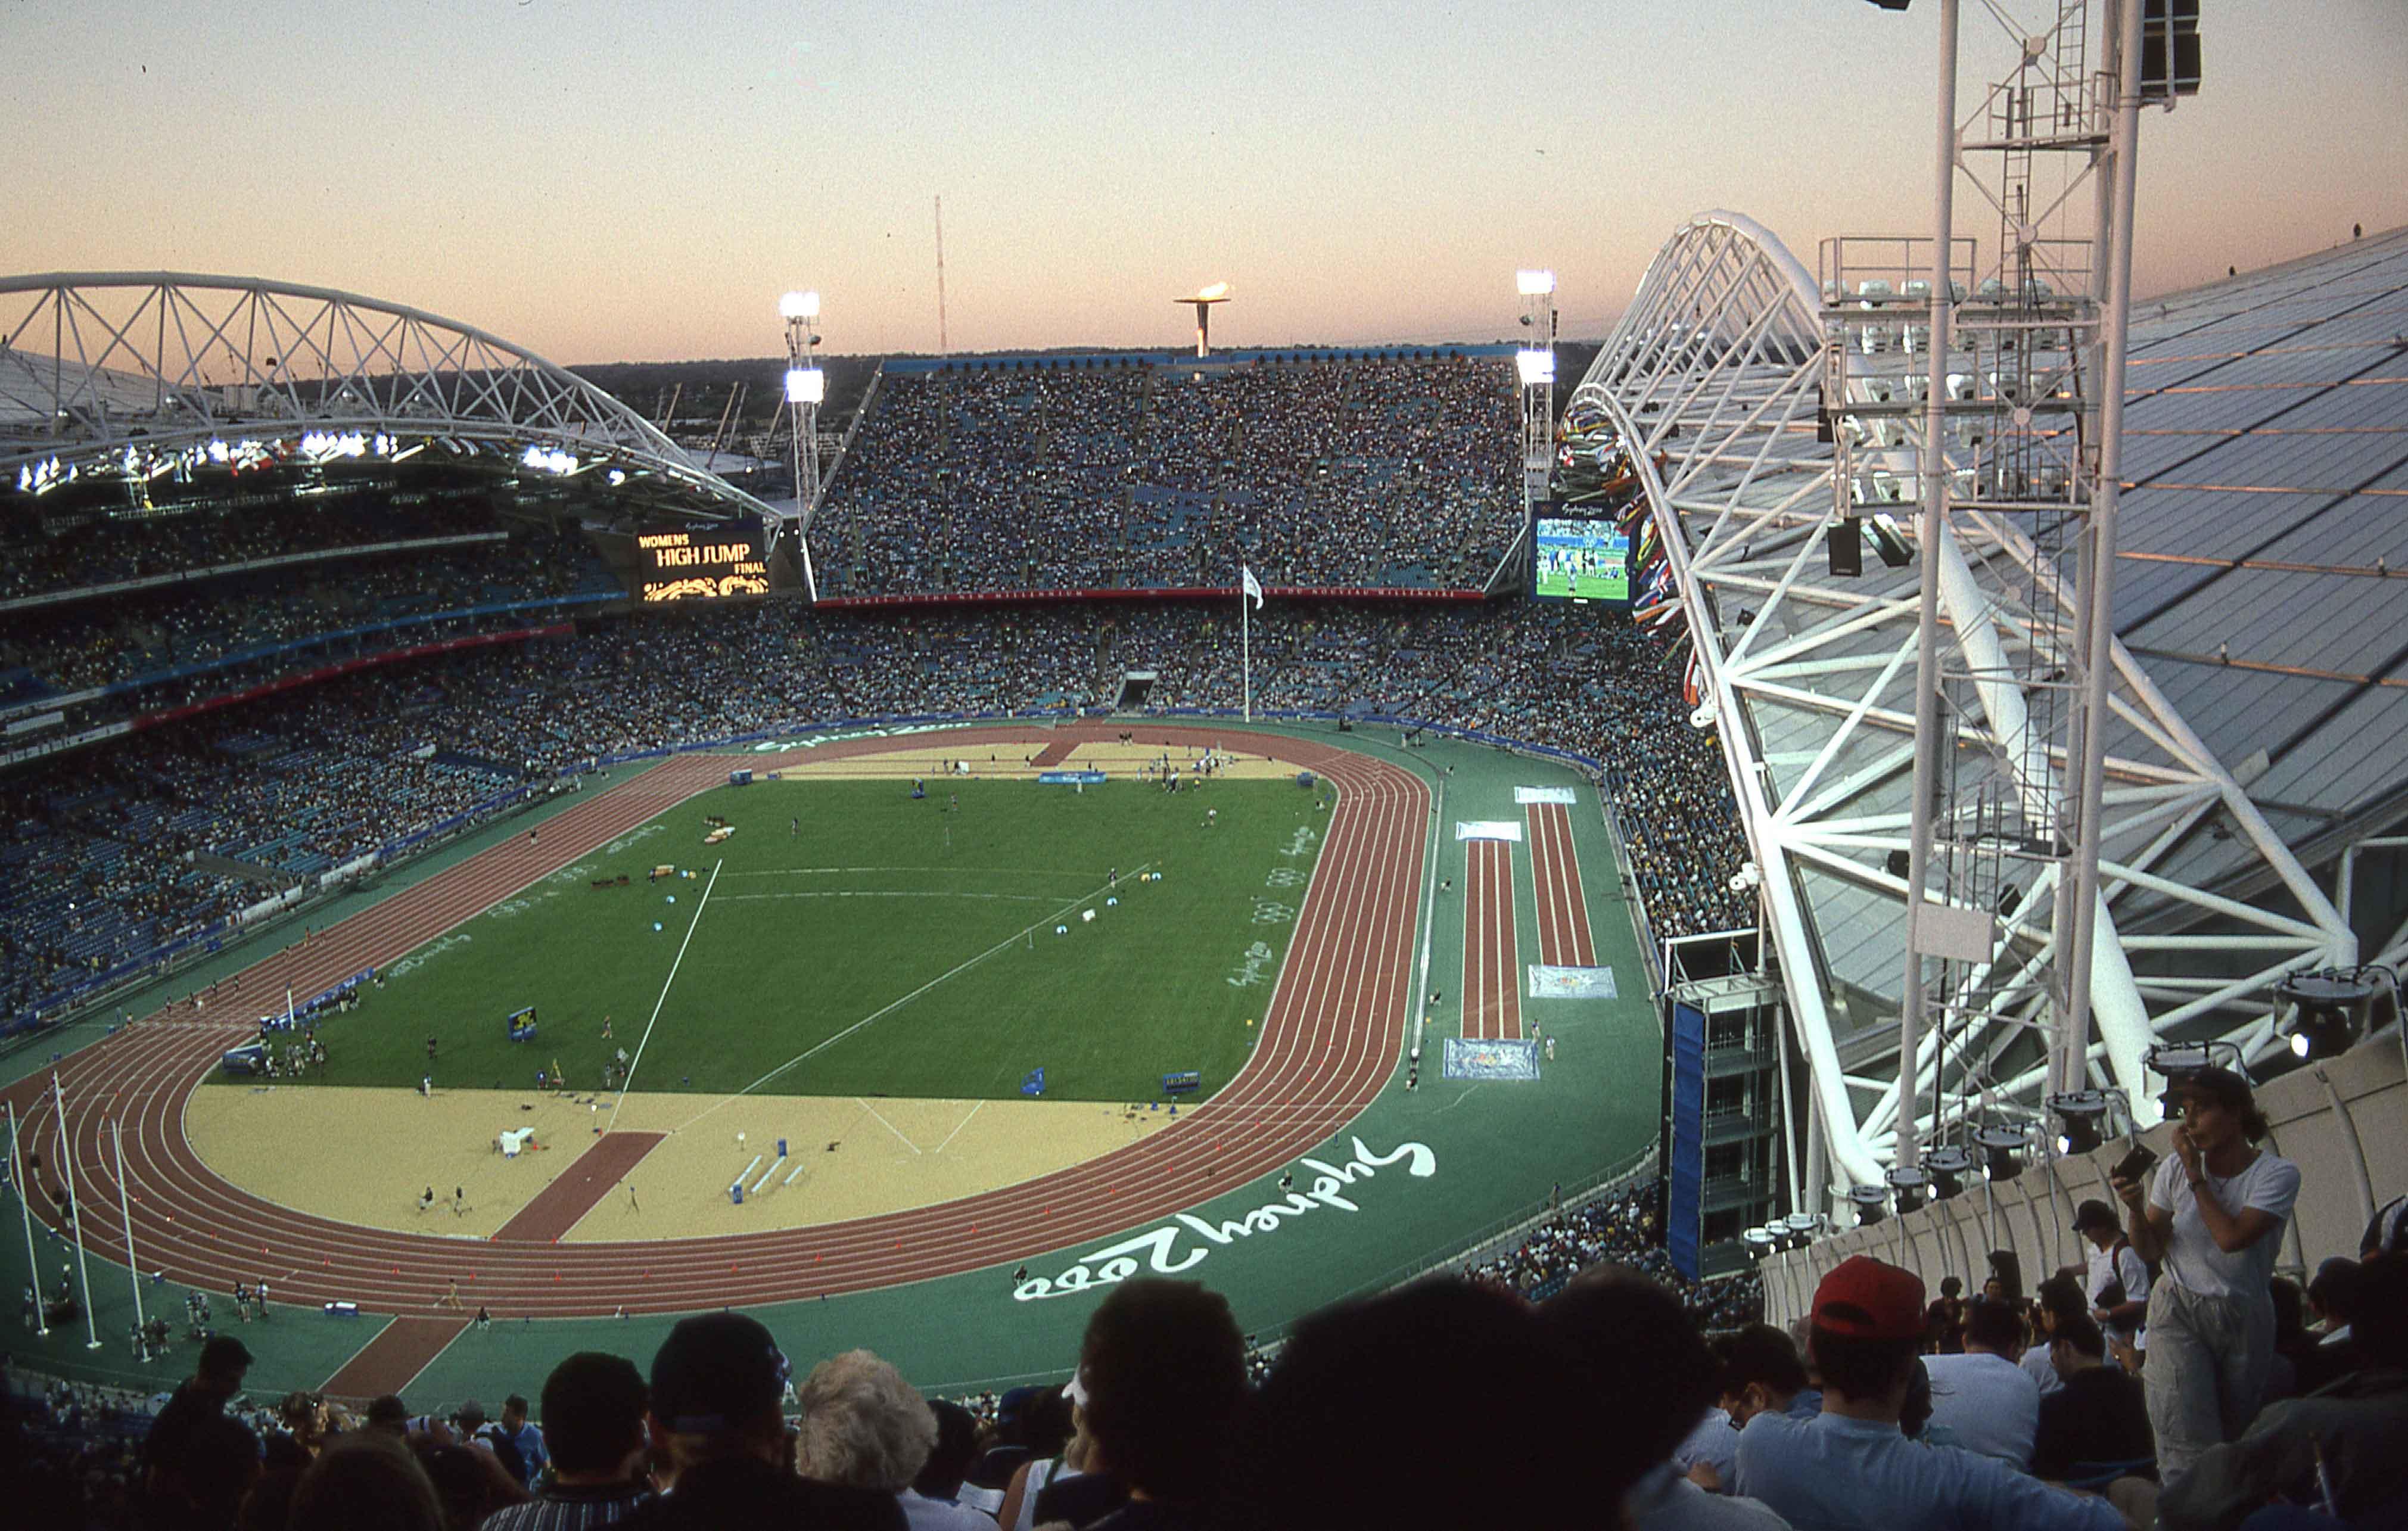 sommerspiele 2000